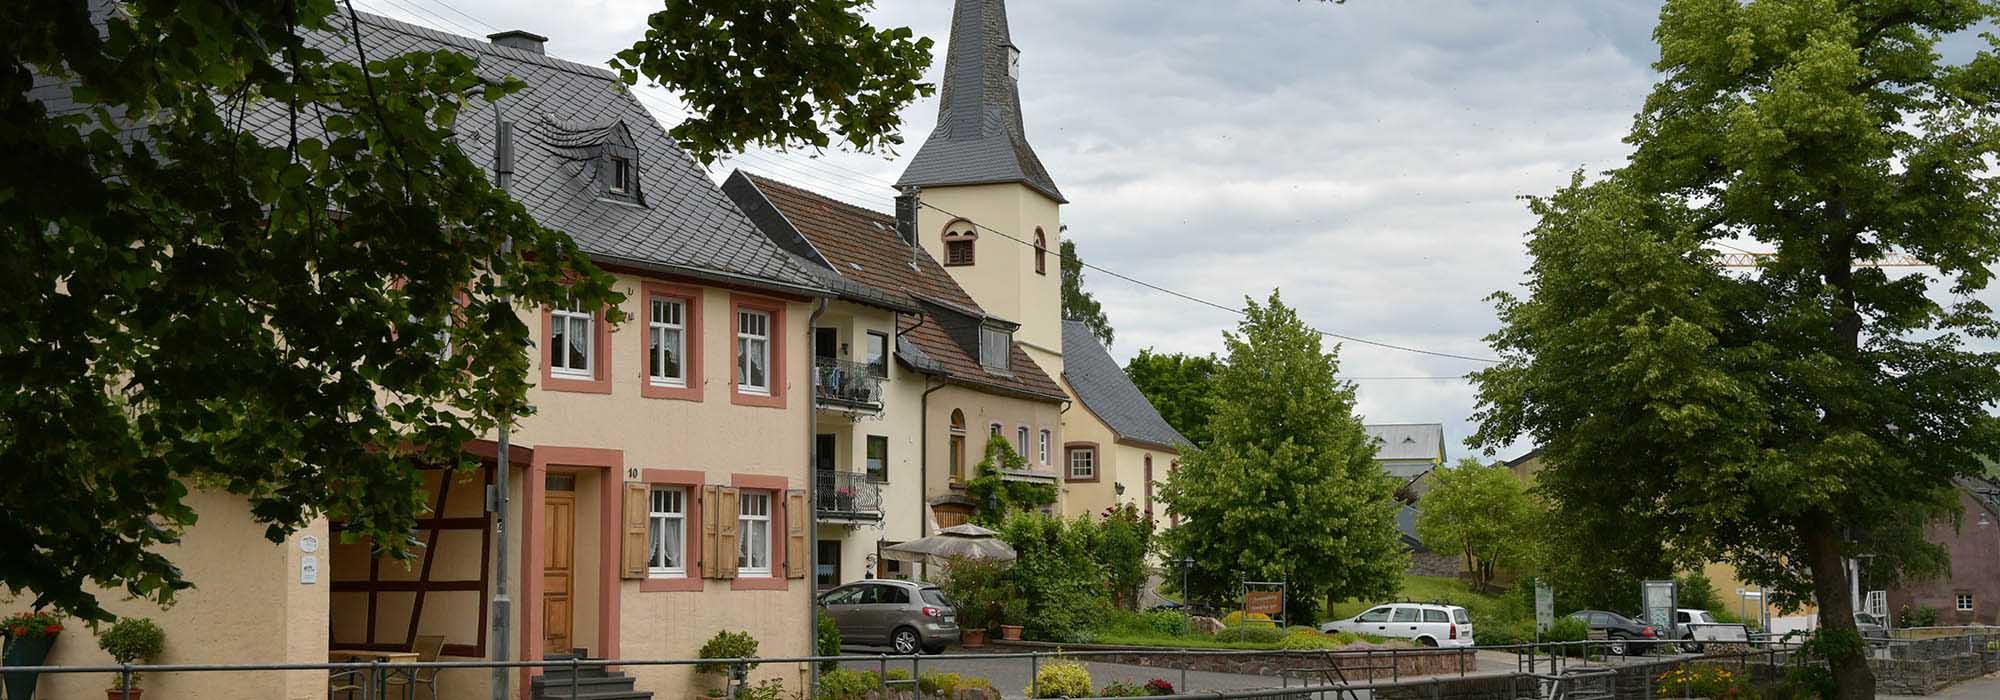 Burgen-Veldenz-ARN_4183